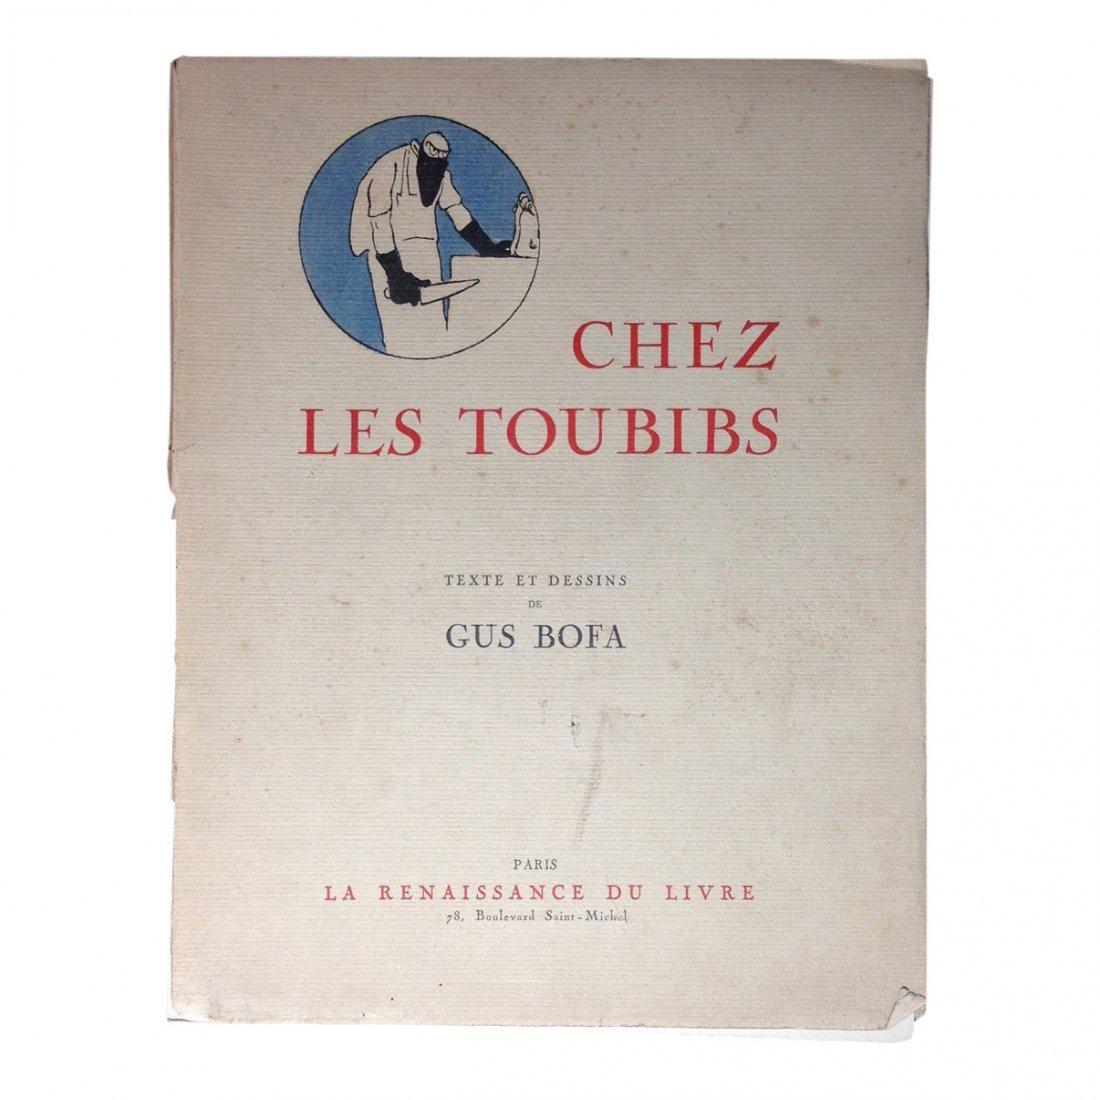 Chez Les Toubibs by Gus Bofa